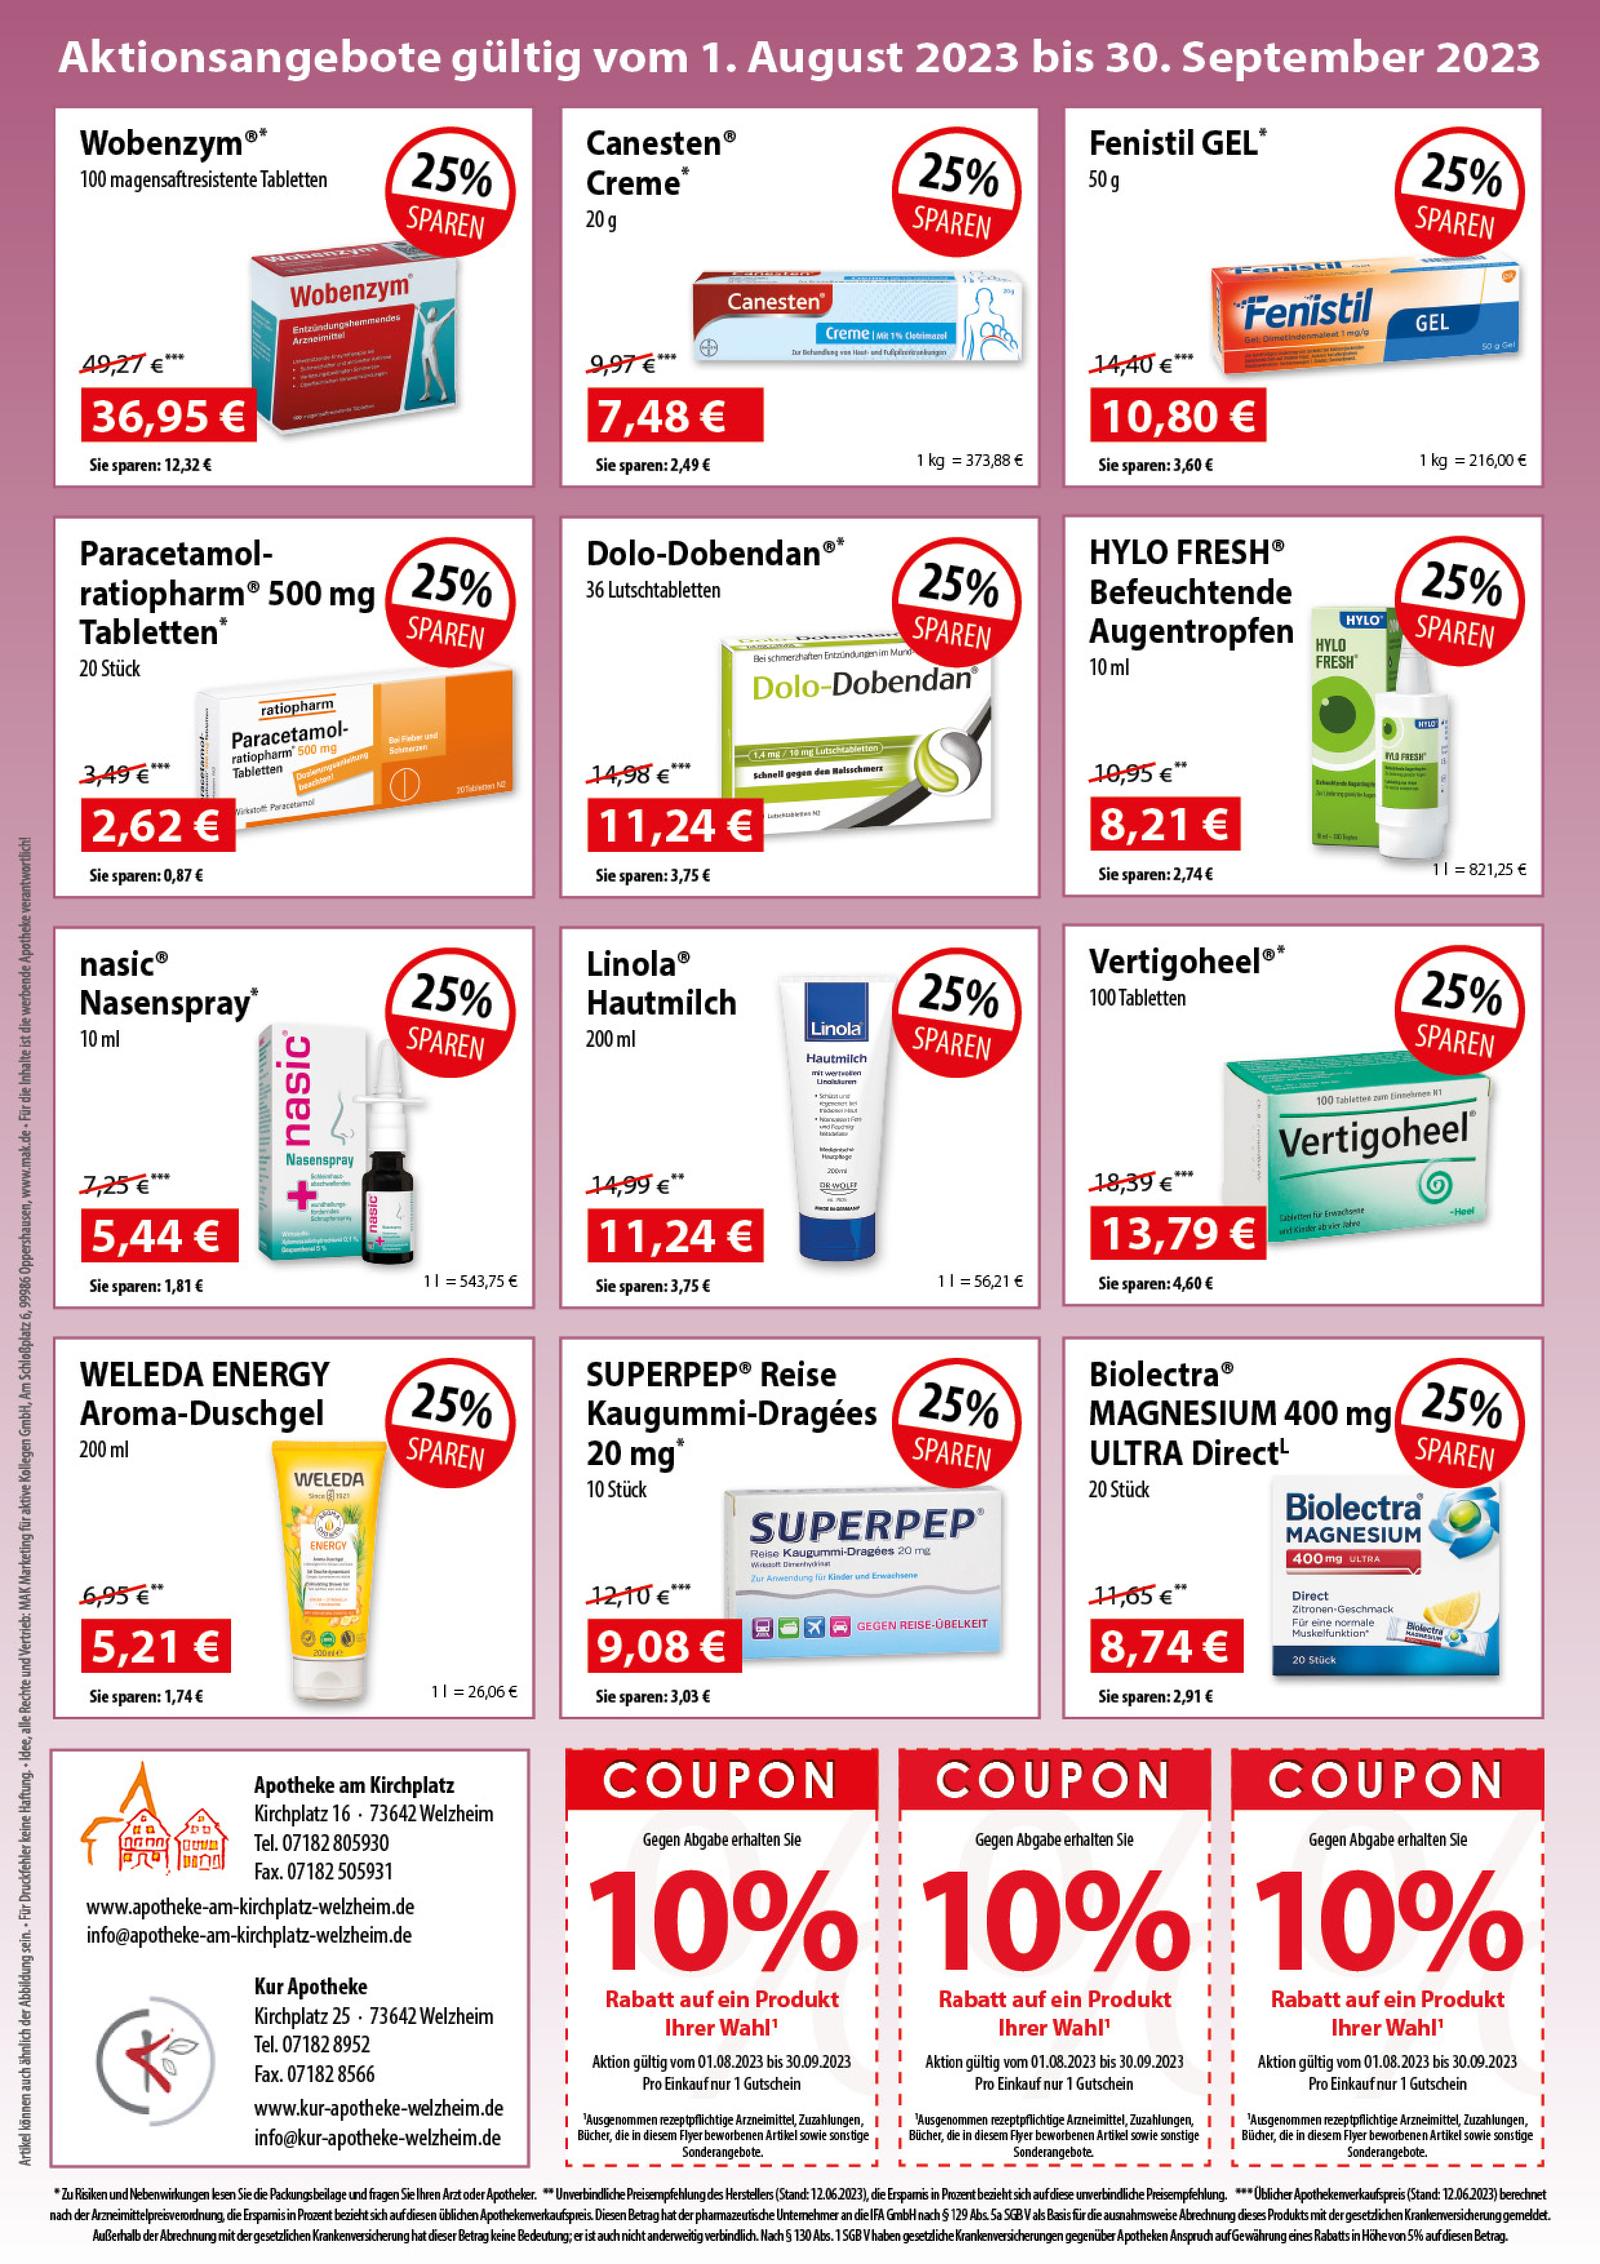 https://mein-uploads.apocdn.net/11984/leaflets/11984_flyer-Seite2.png